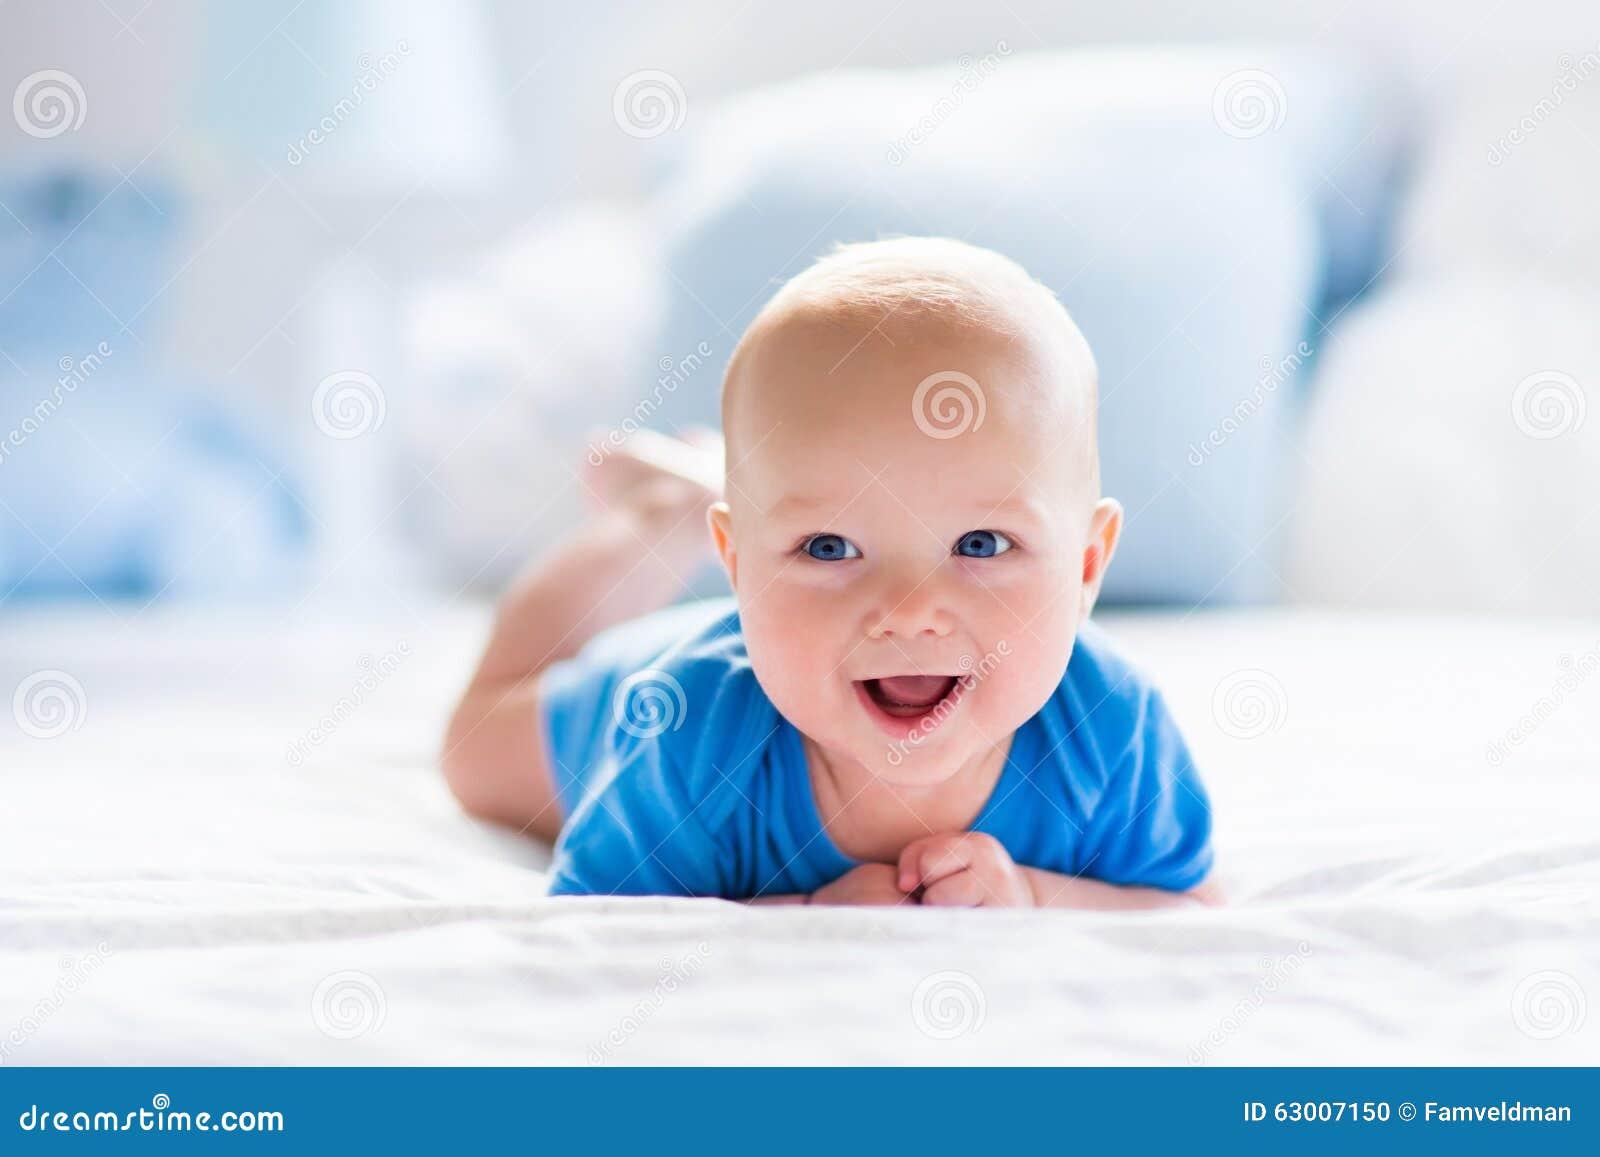 Baby Boy In White Sunny Bedroom Stock Photo Image 63007150